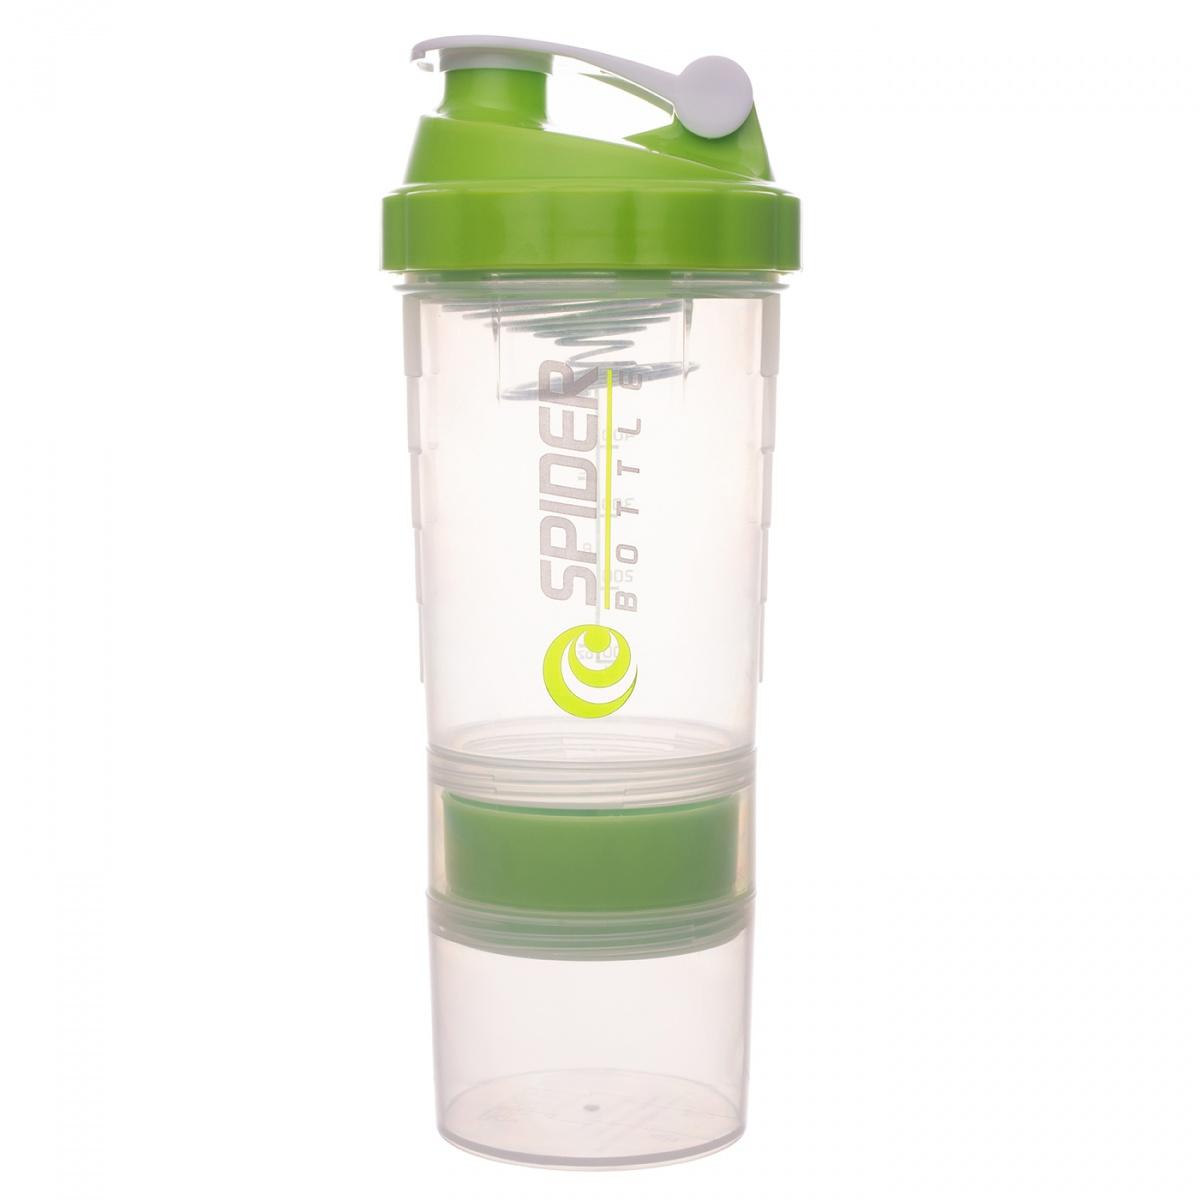 Шейкер Spider Bottle Maxi2Go 2 отсека 600 мл прозрачный/зеленый